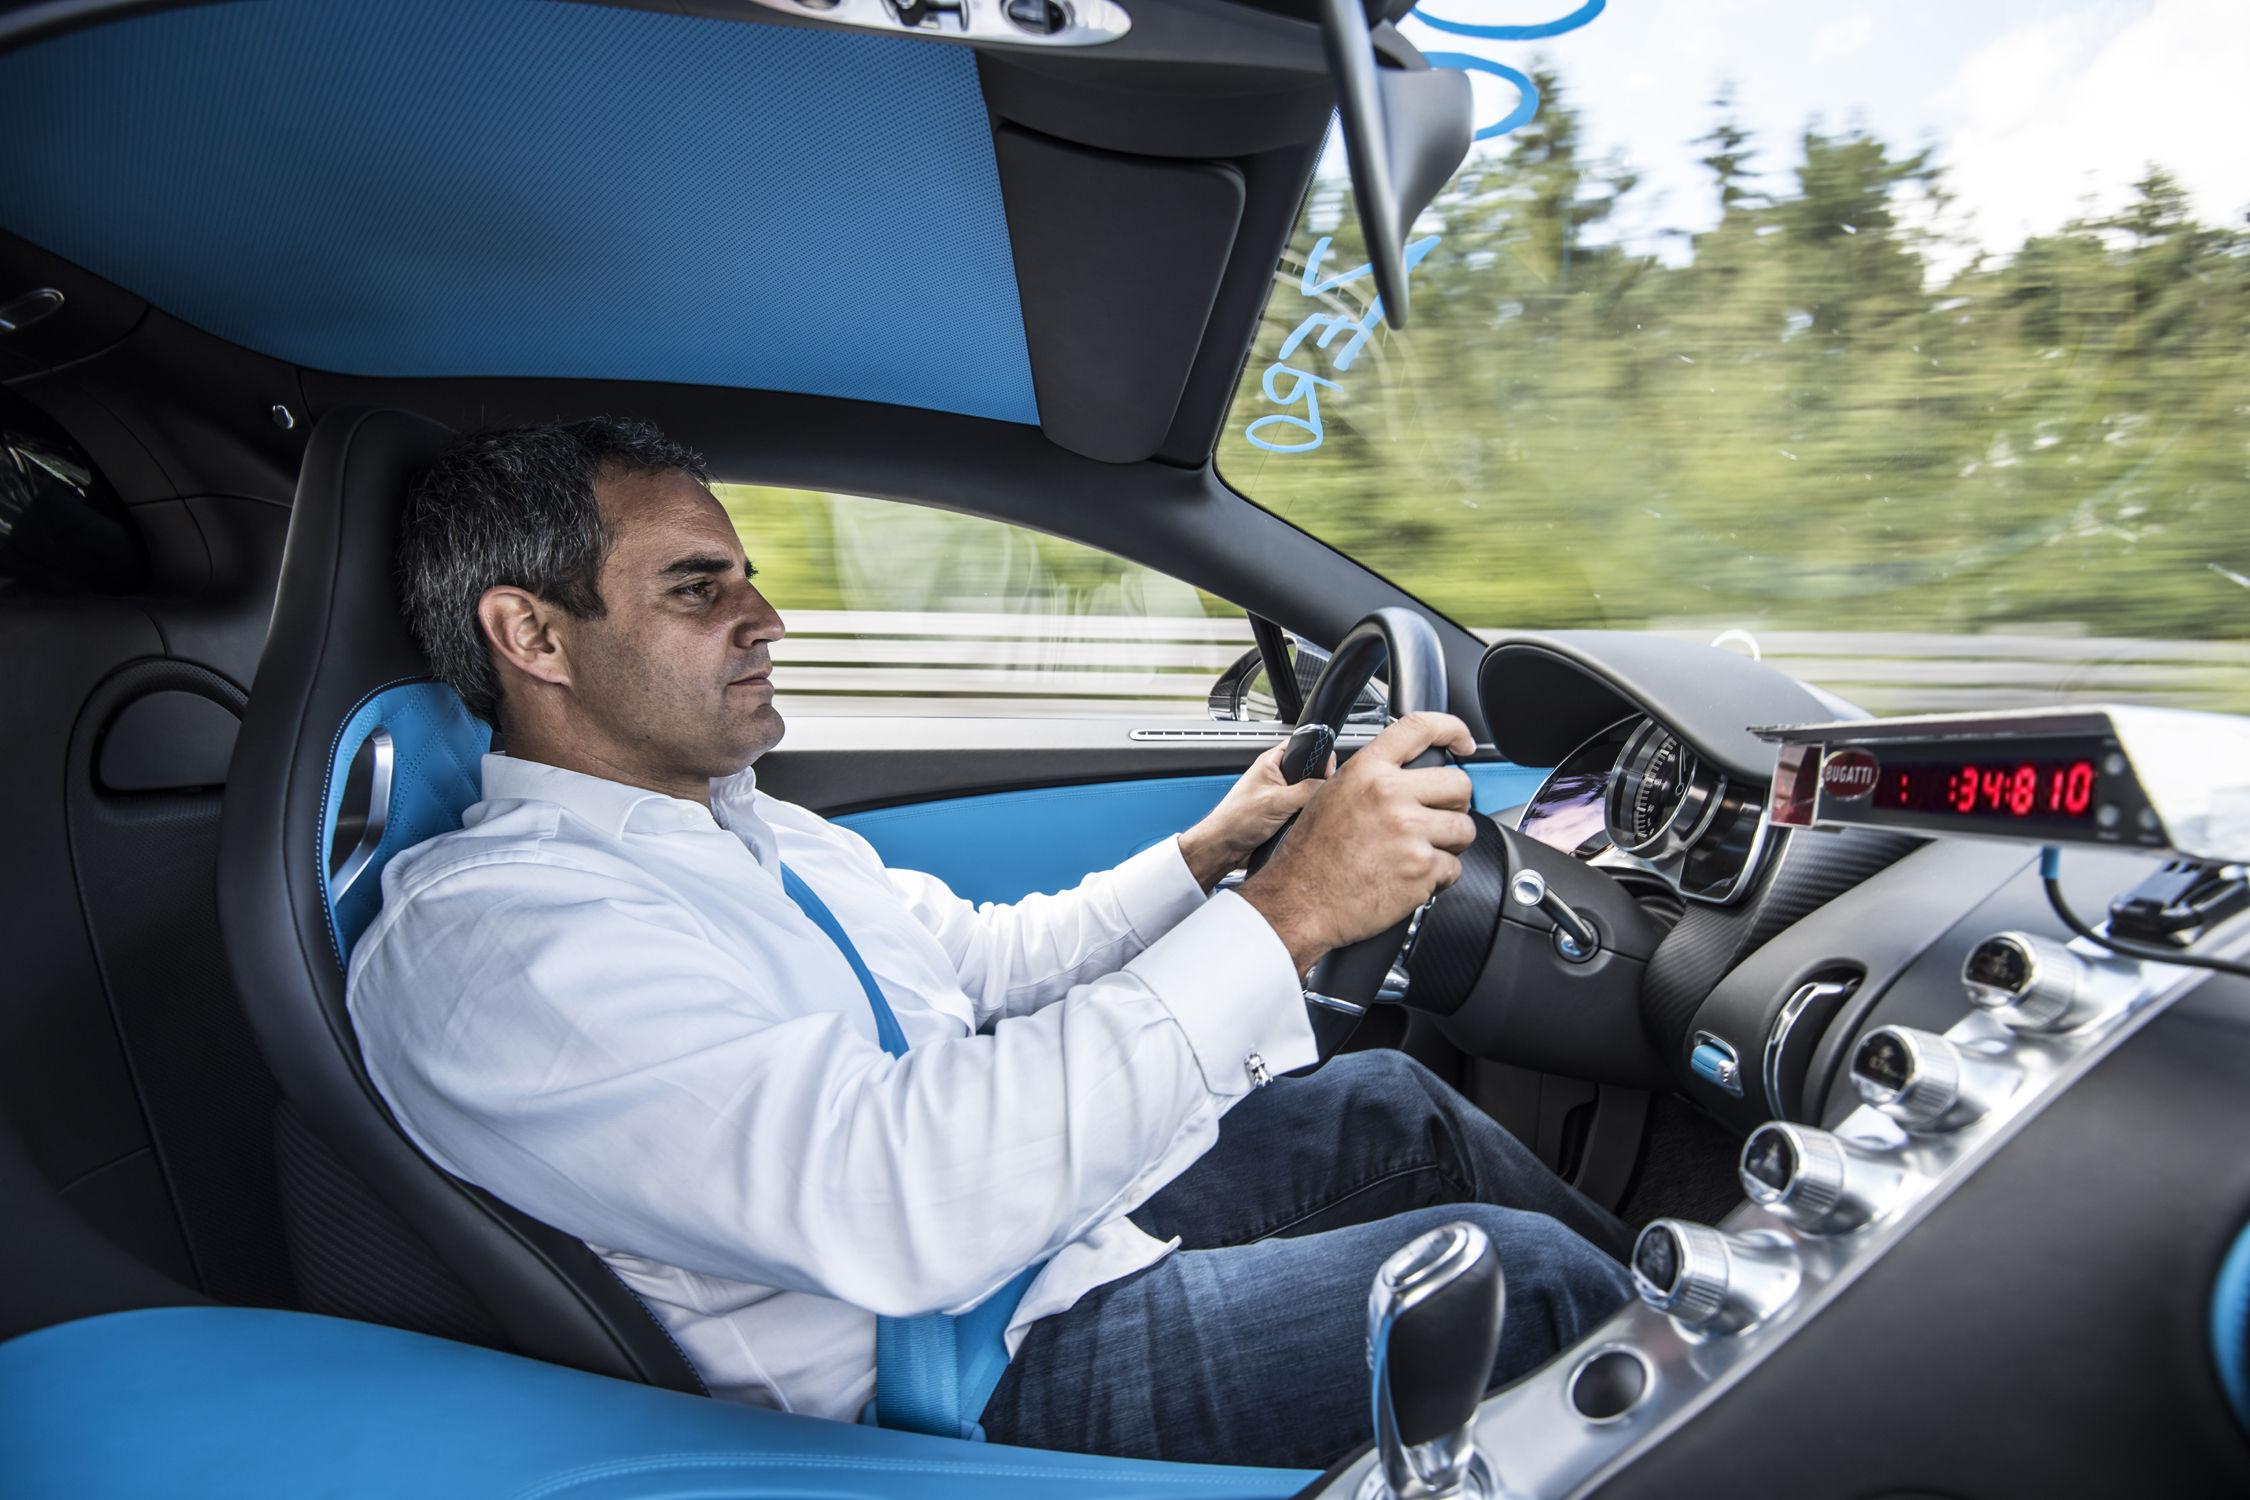 Bugatti Chiron : 0-400-0 km/h en moins de 42 secondes [RECORD]